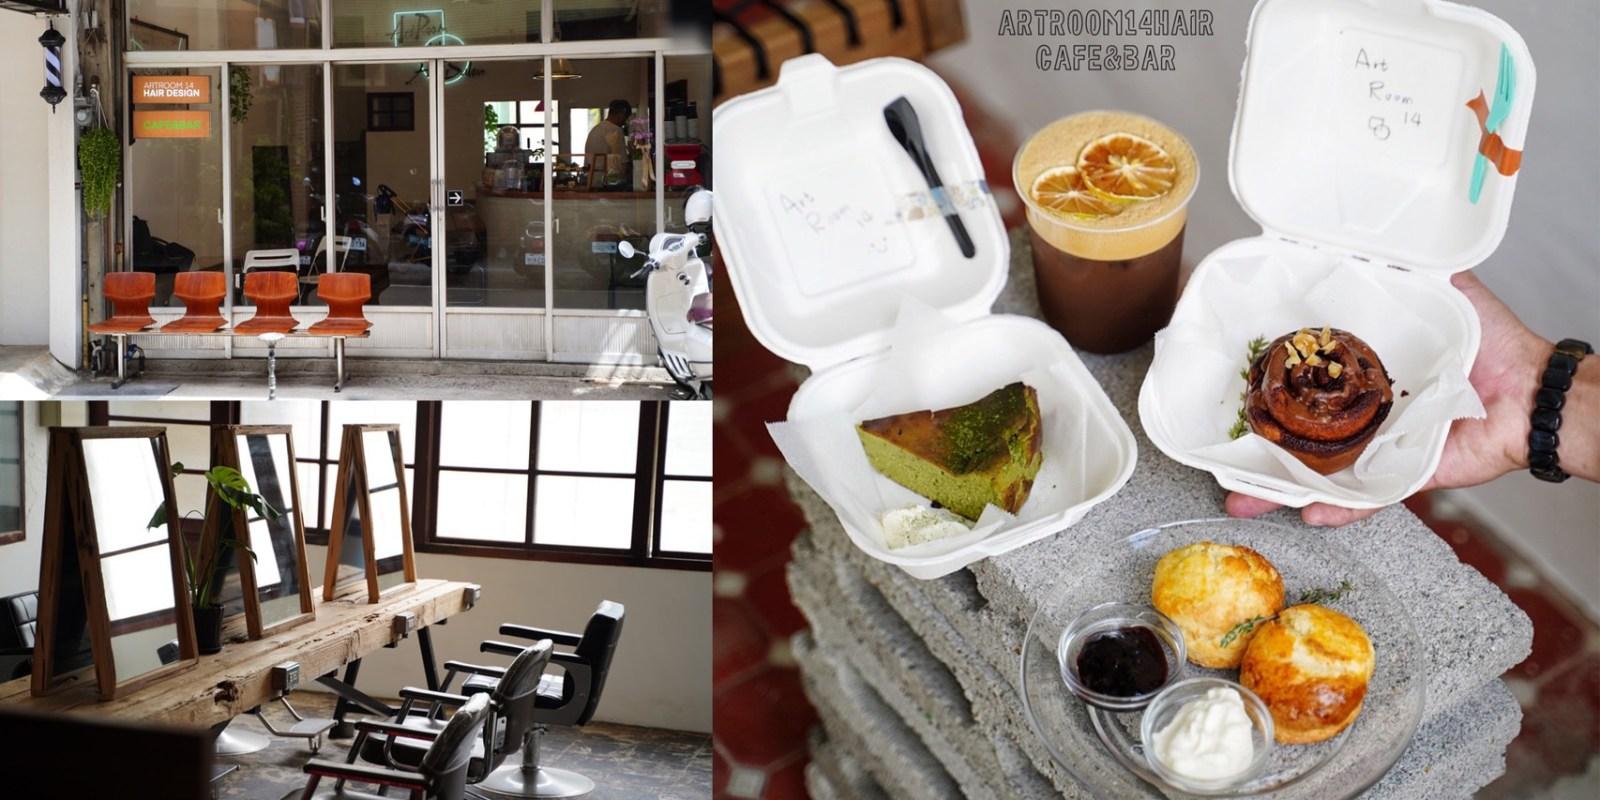 【ArtRoom 藝室14 Hair Salon】新竹新開幕.髮廊結合咖啡廳&酒吧!來剪頭髮還可以順便享用下午茶,推薦肉桂捲、司康!